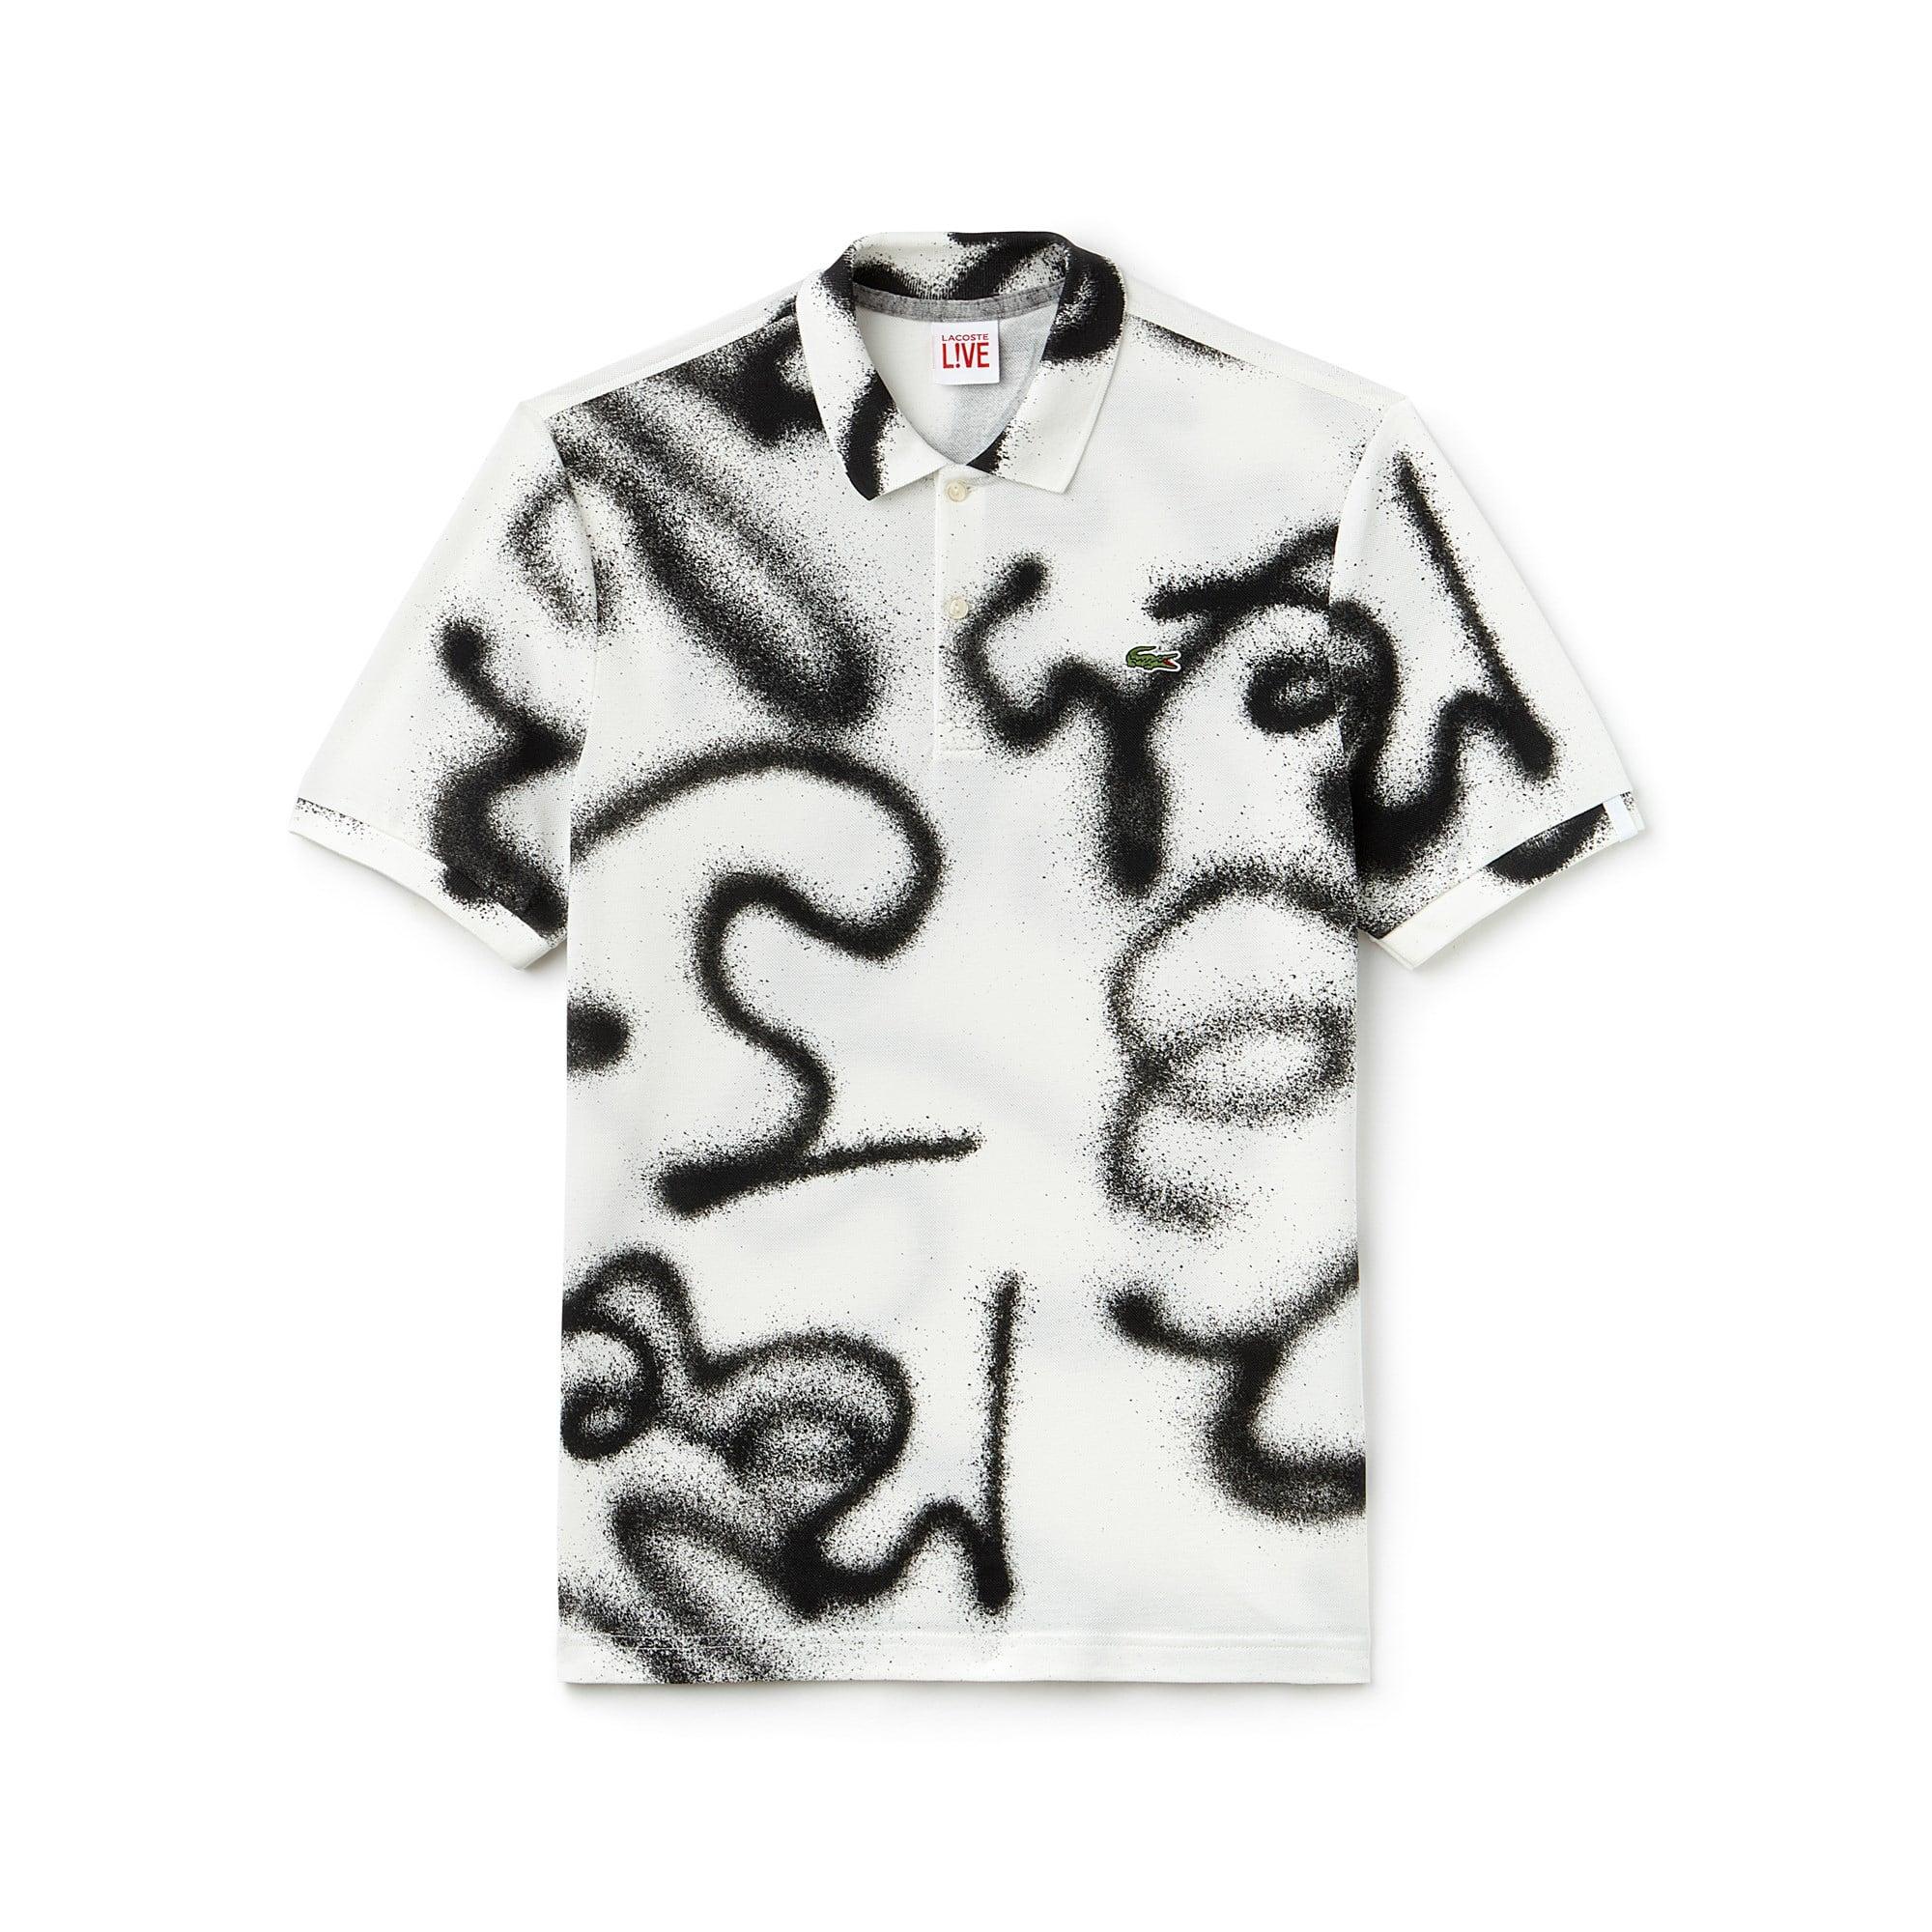 Herren LACOSTE LIVE Regular Fit Mini-Piqué Poloshirt mit Print